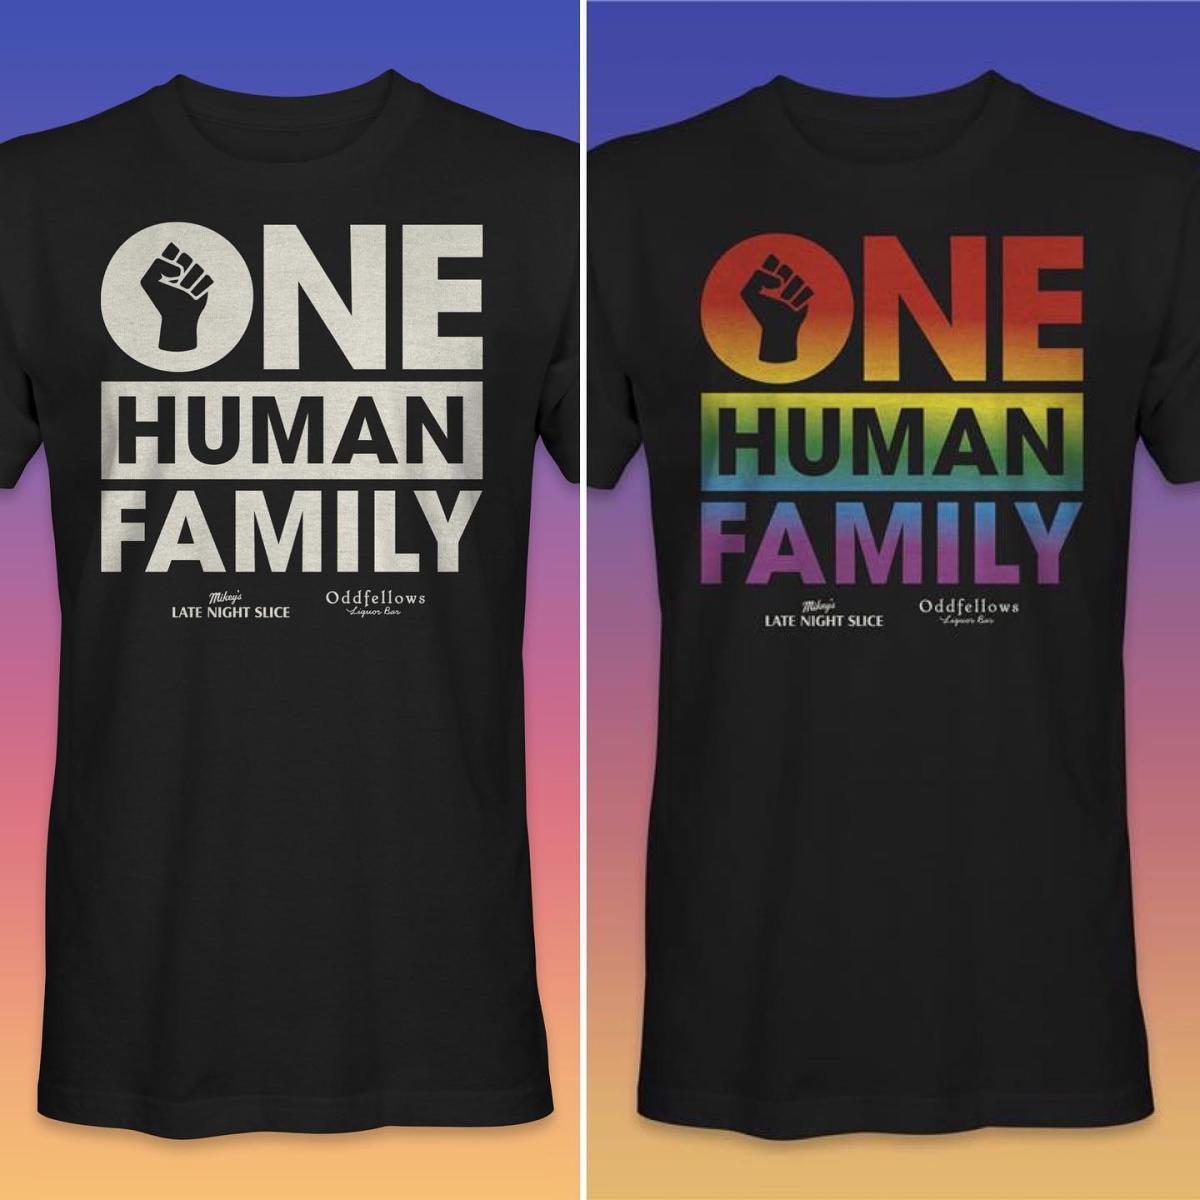 One Human Family shirt